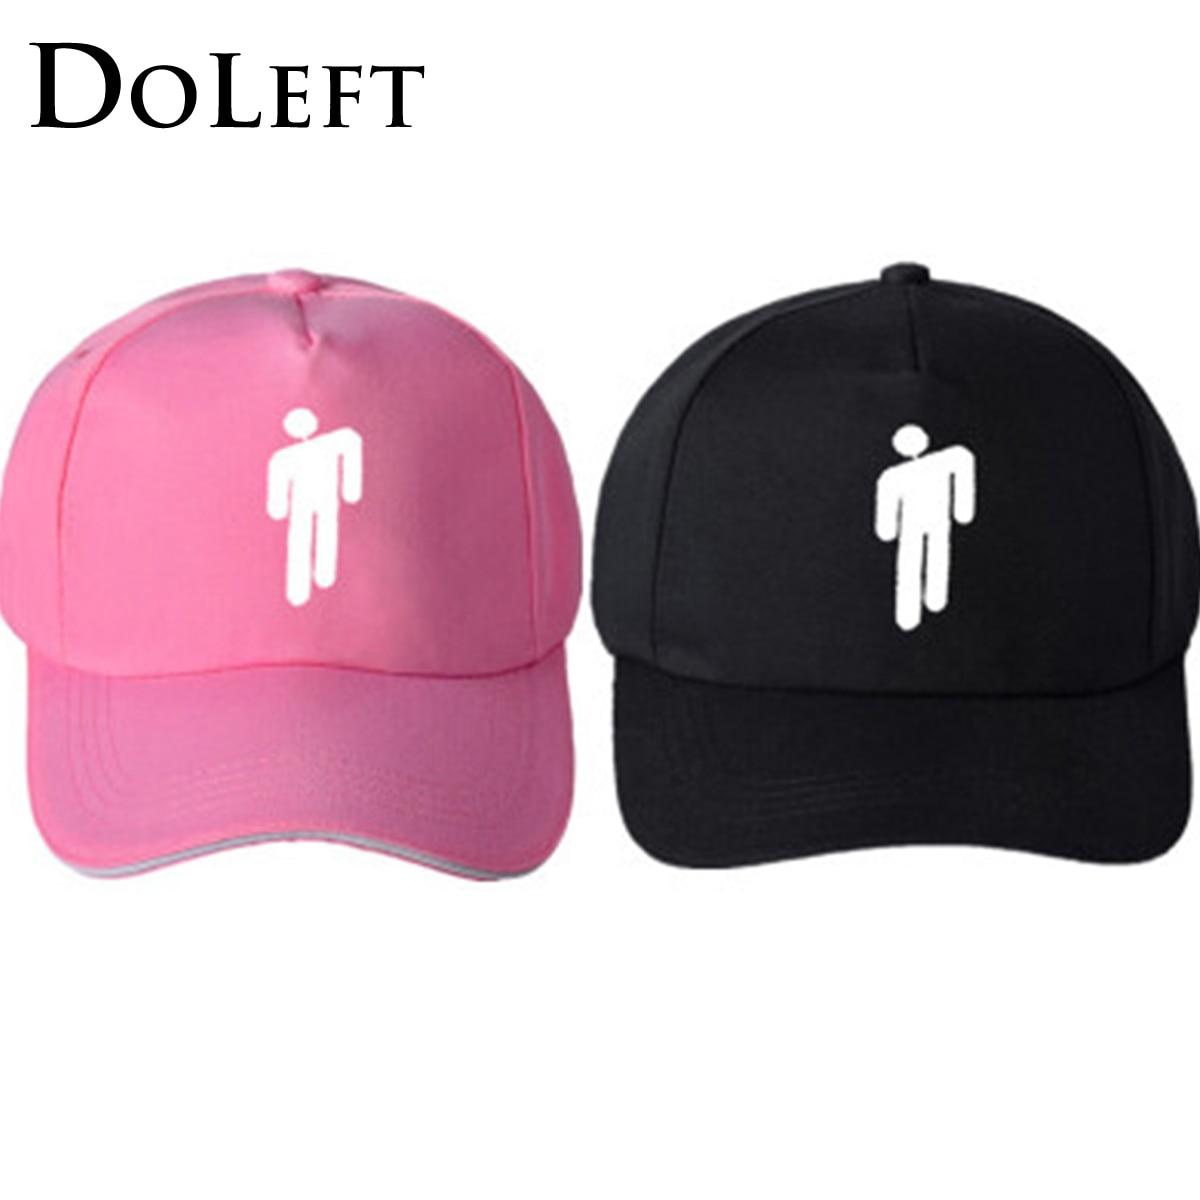 2019 Billie Eilish Baseball Caps Adjustable Streetwear Hiphop Caps Snapback Unisex Cool Cotton Dad Hat Billie Eilish Beanie Hats